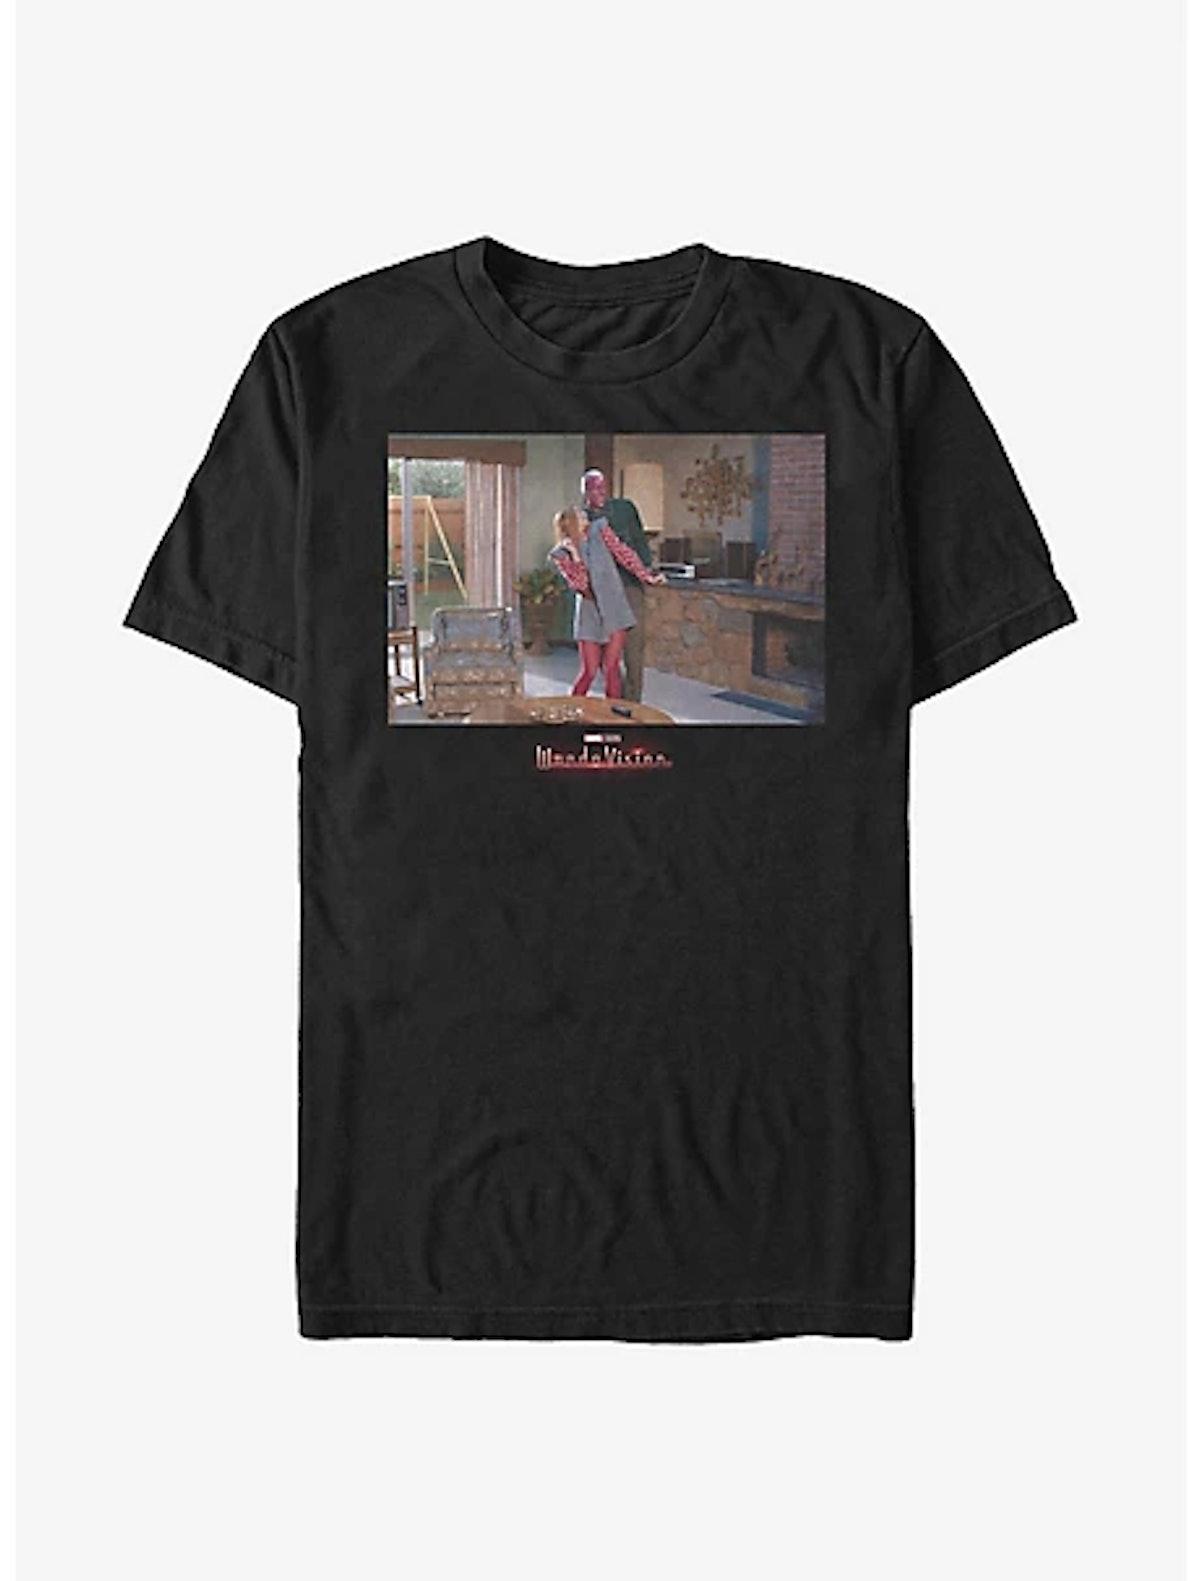 Hot Topic Marvel WandaVision The Era T-Shirt